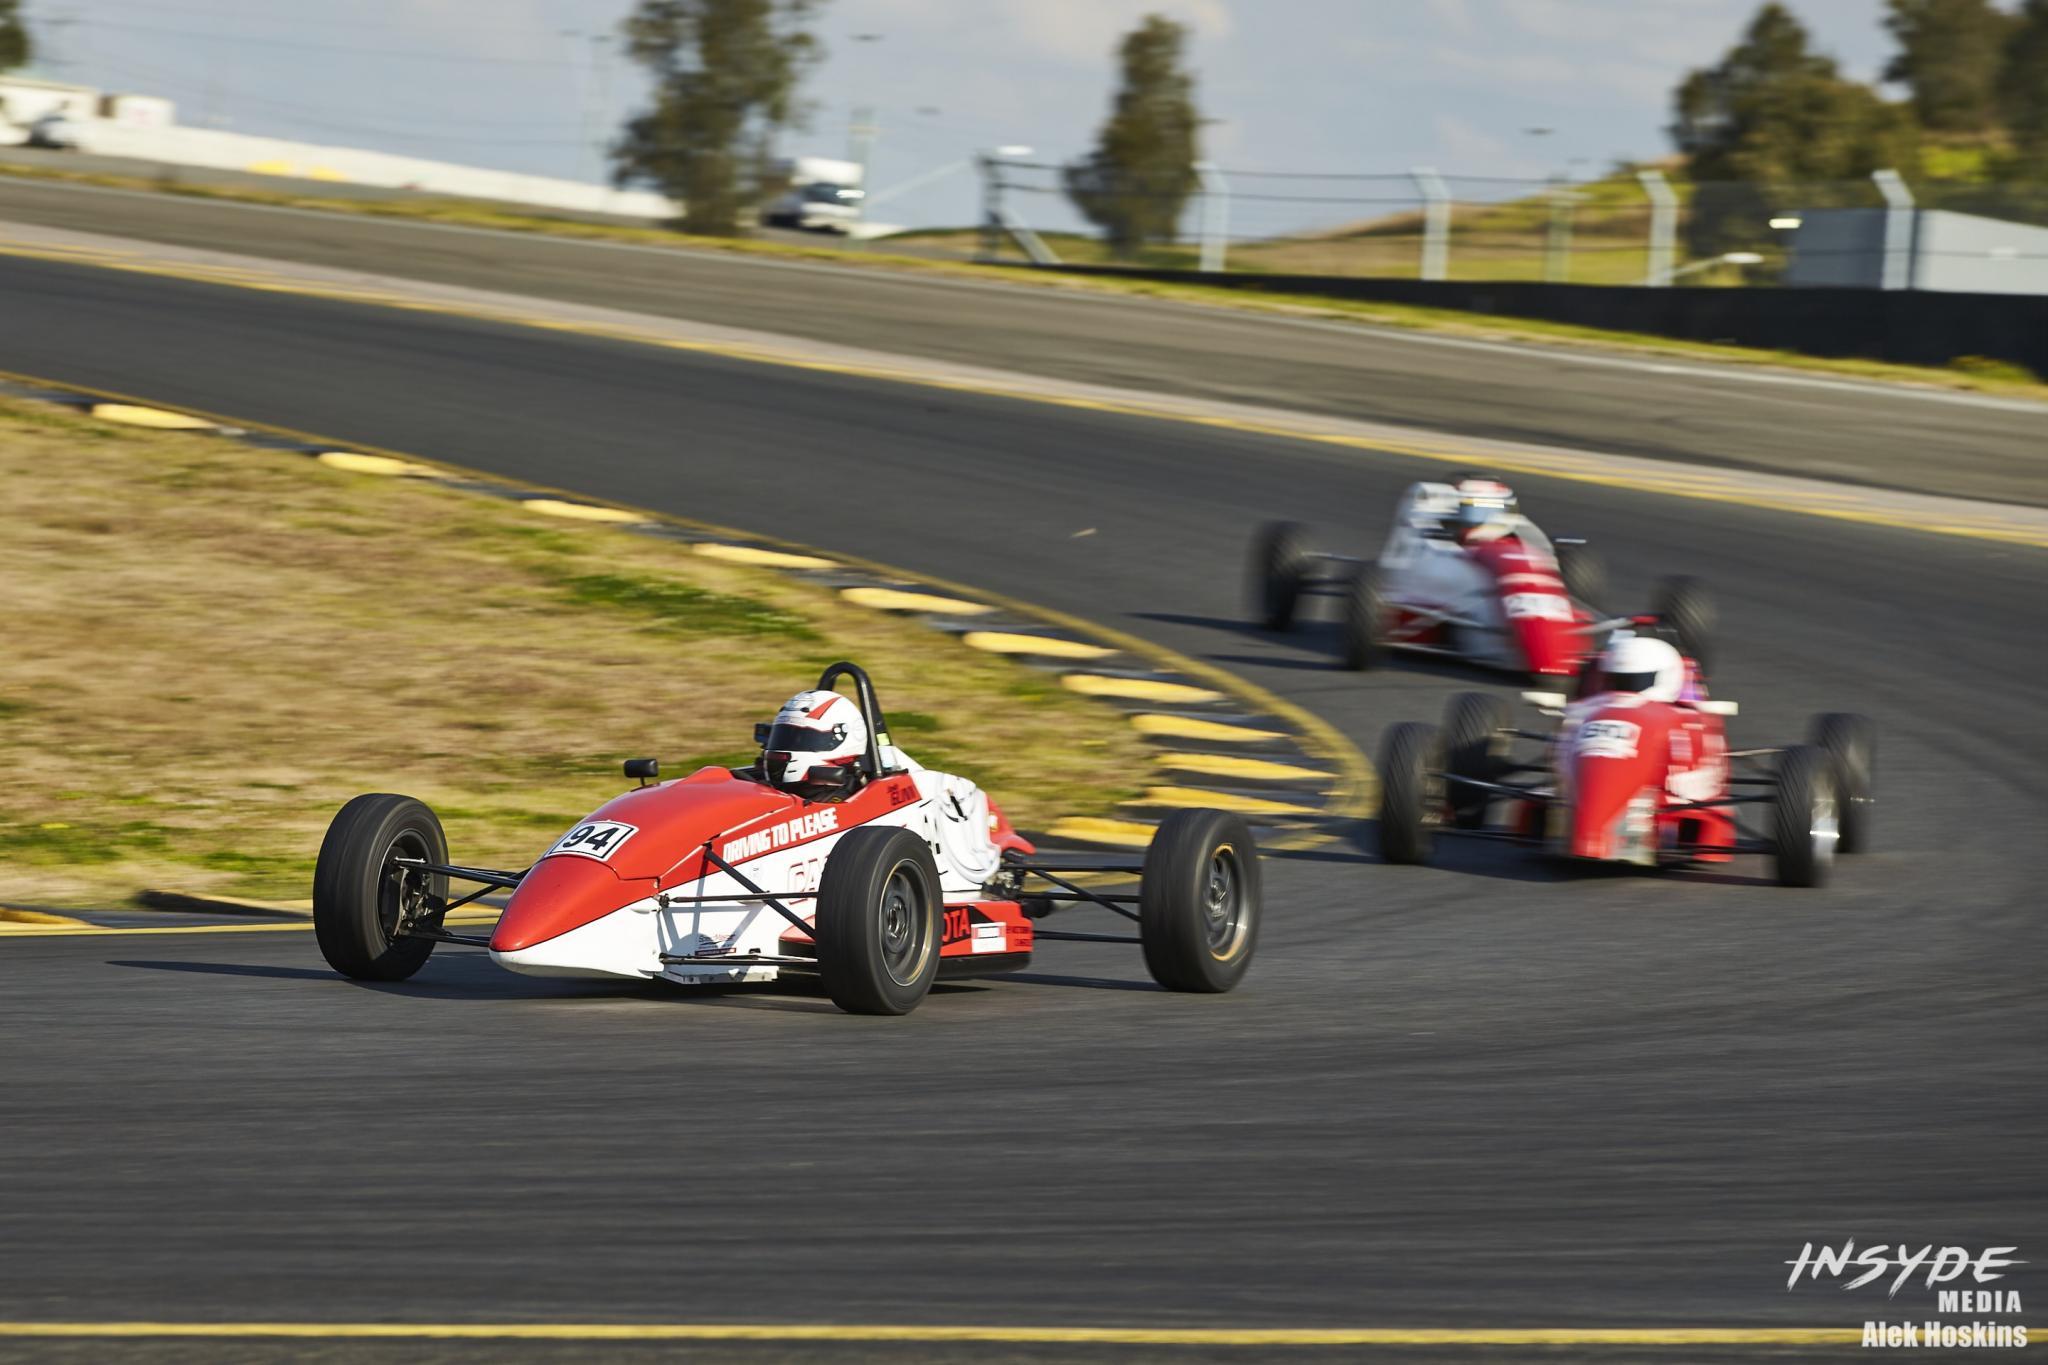 NSW Motor Racing Champs at Sydney Motorsport Park - 2019